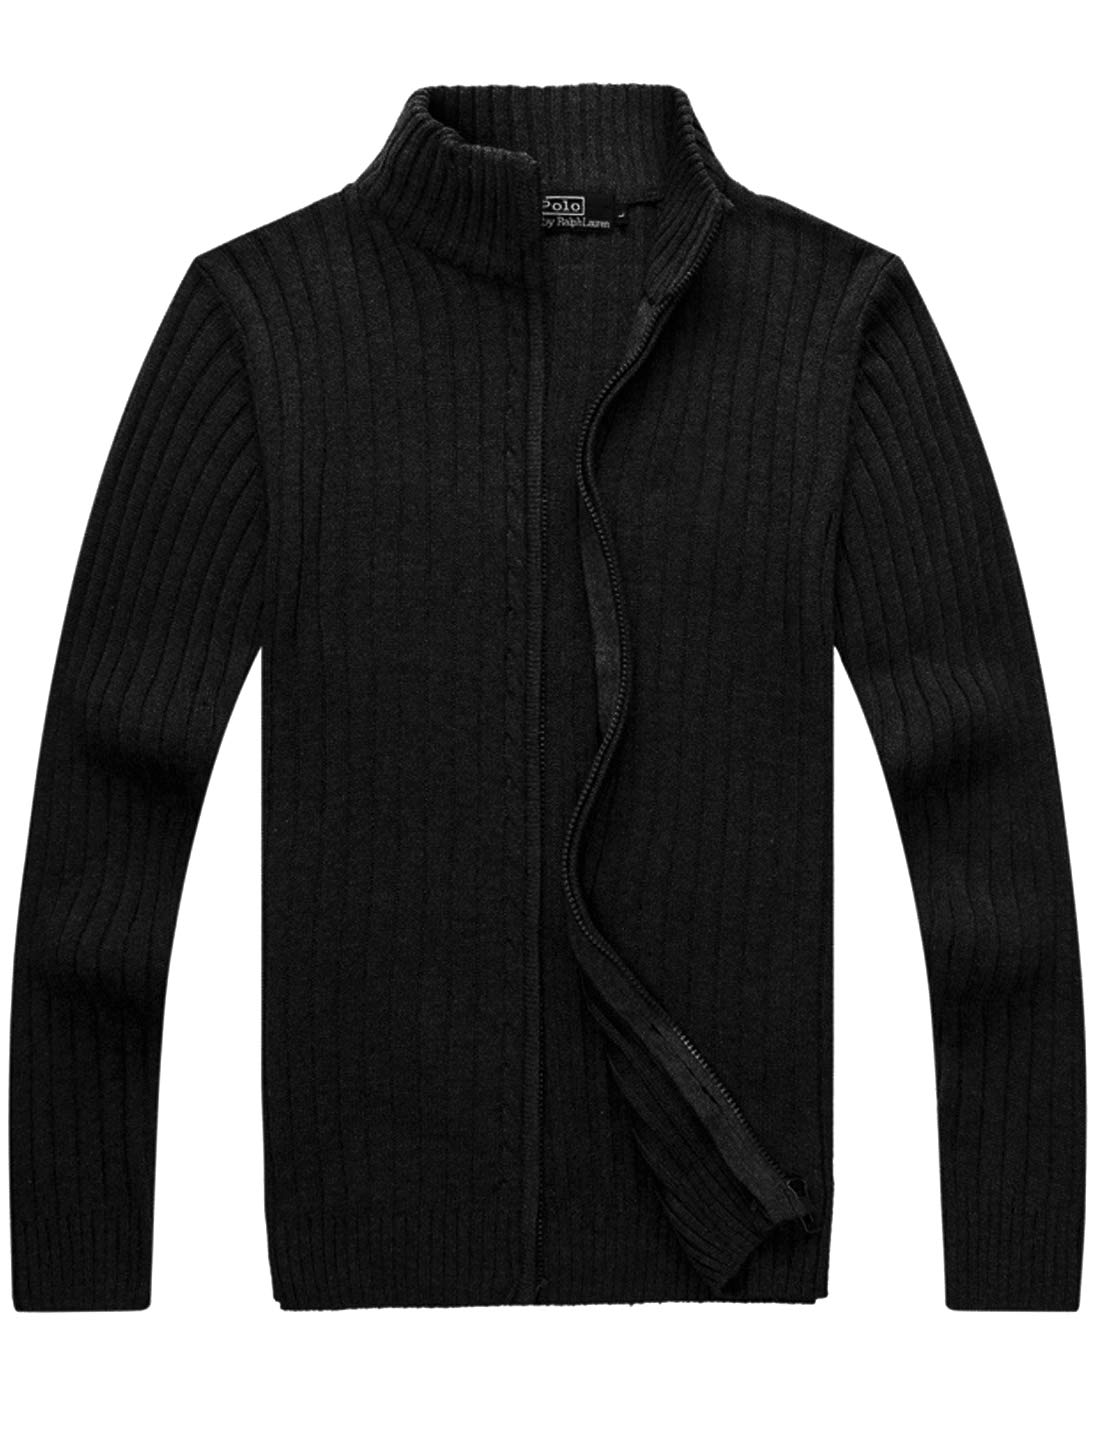 Yeokou Men's Casual Autumn Stand Collar Full Zip Up Knitted Cardigan Sweater (Medium, Black)